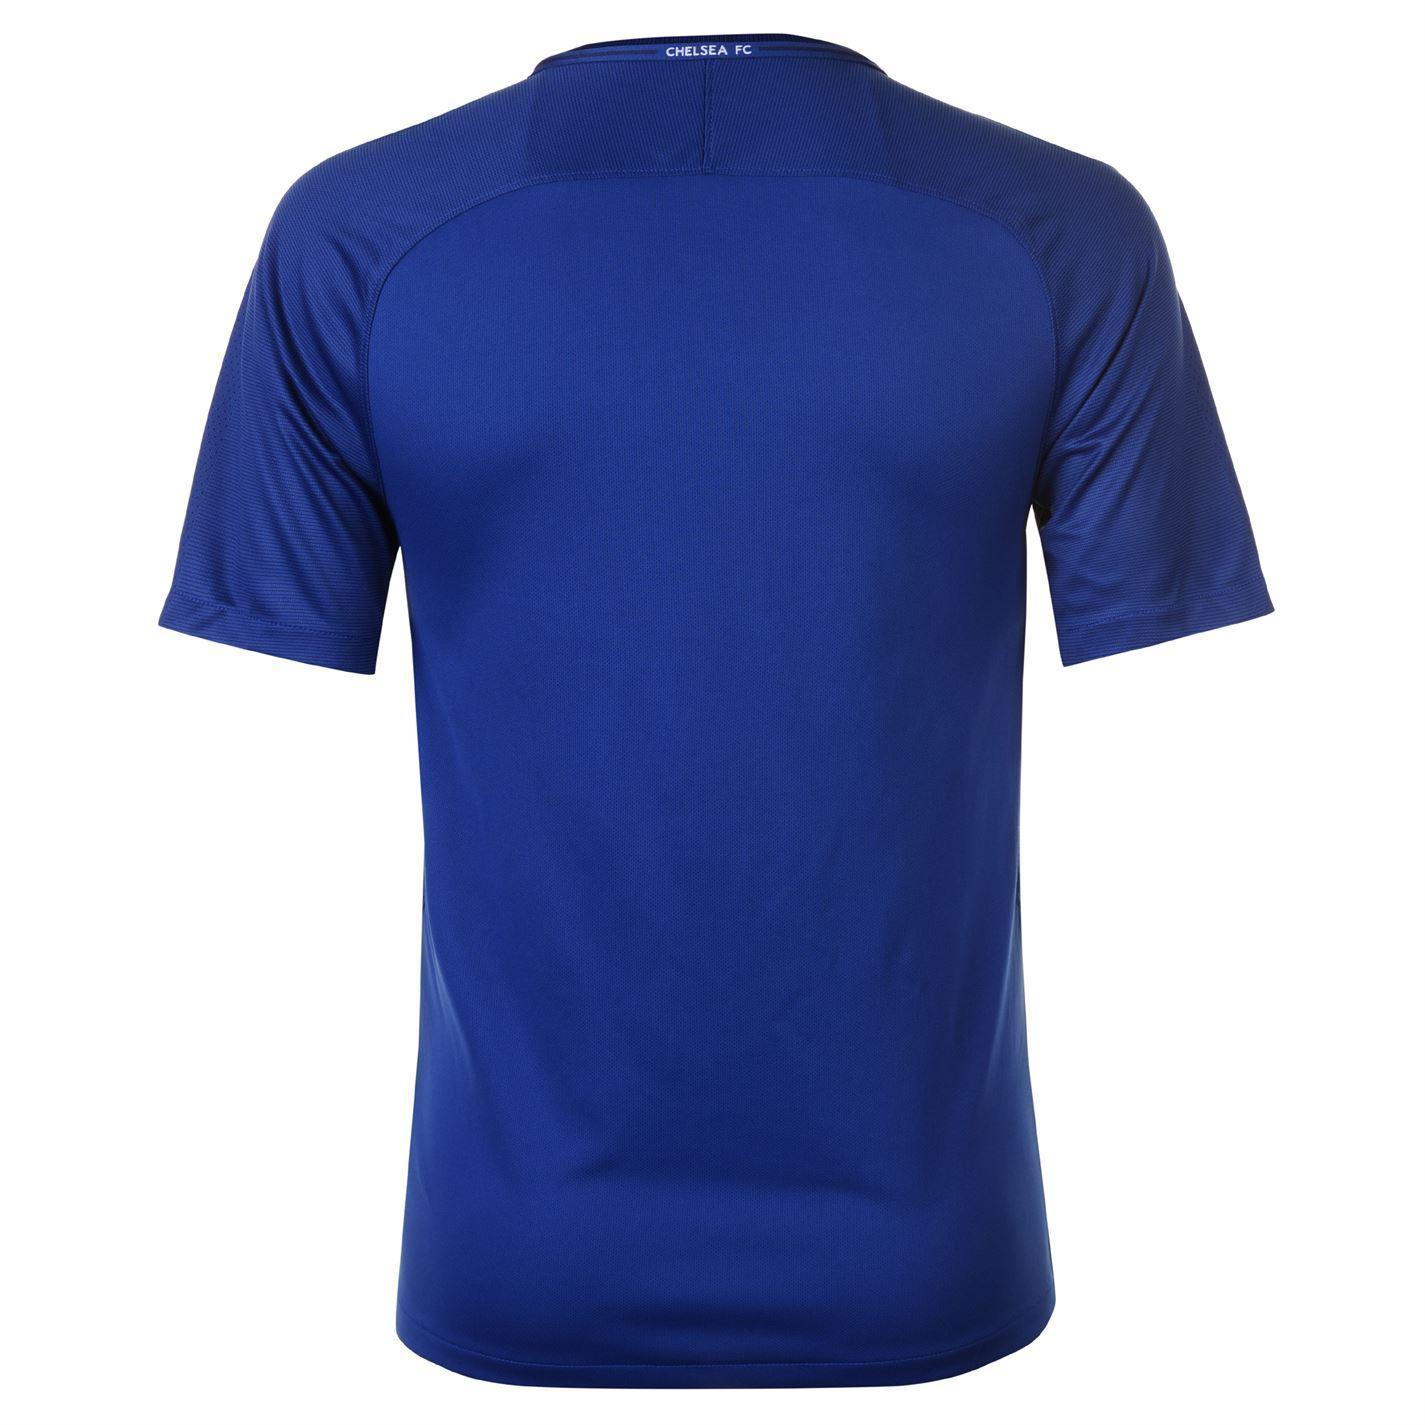 de191657b ... Nike Chelsea Home Jersey 2017 2018 Mens Blue Football Soccer Fan Shirt  Top ...